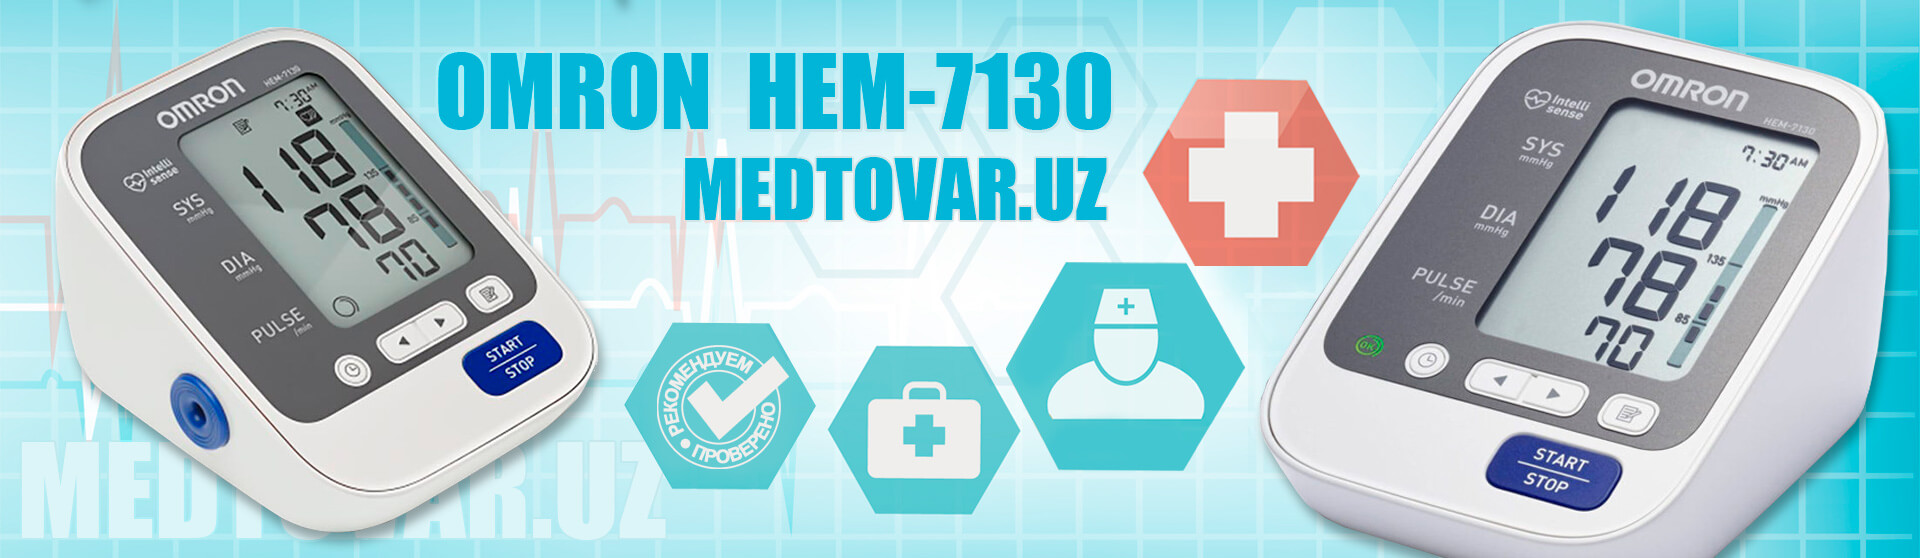 Omron HEM-7130